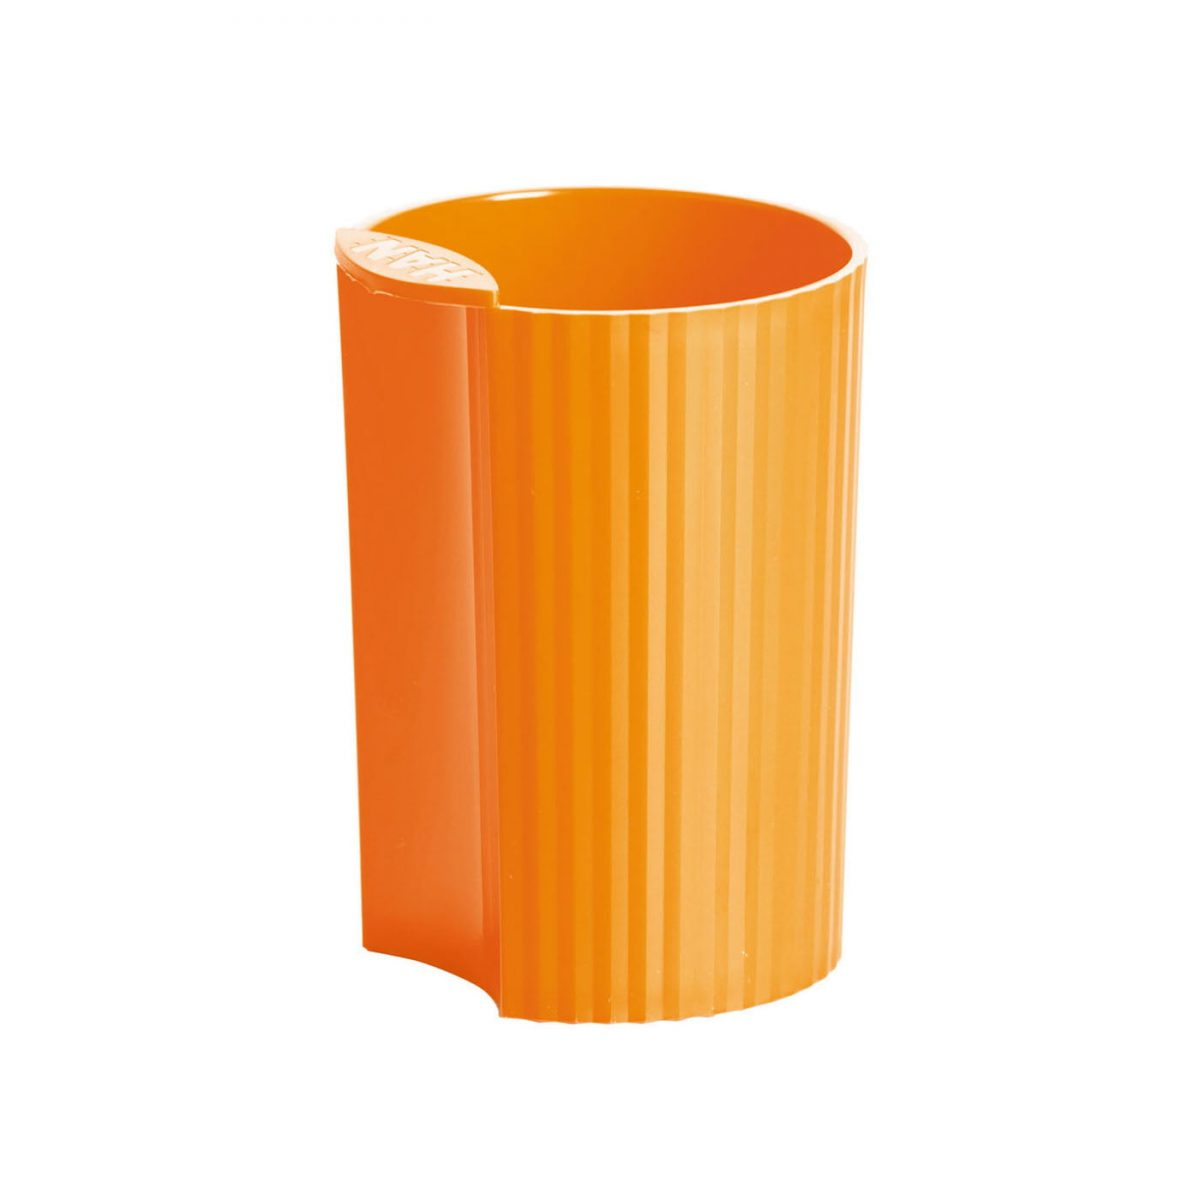 Suport pentru instrumente de scris, HAN Loop Trend-Colours - orange